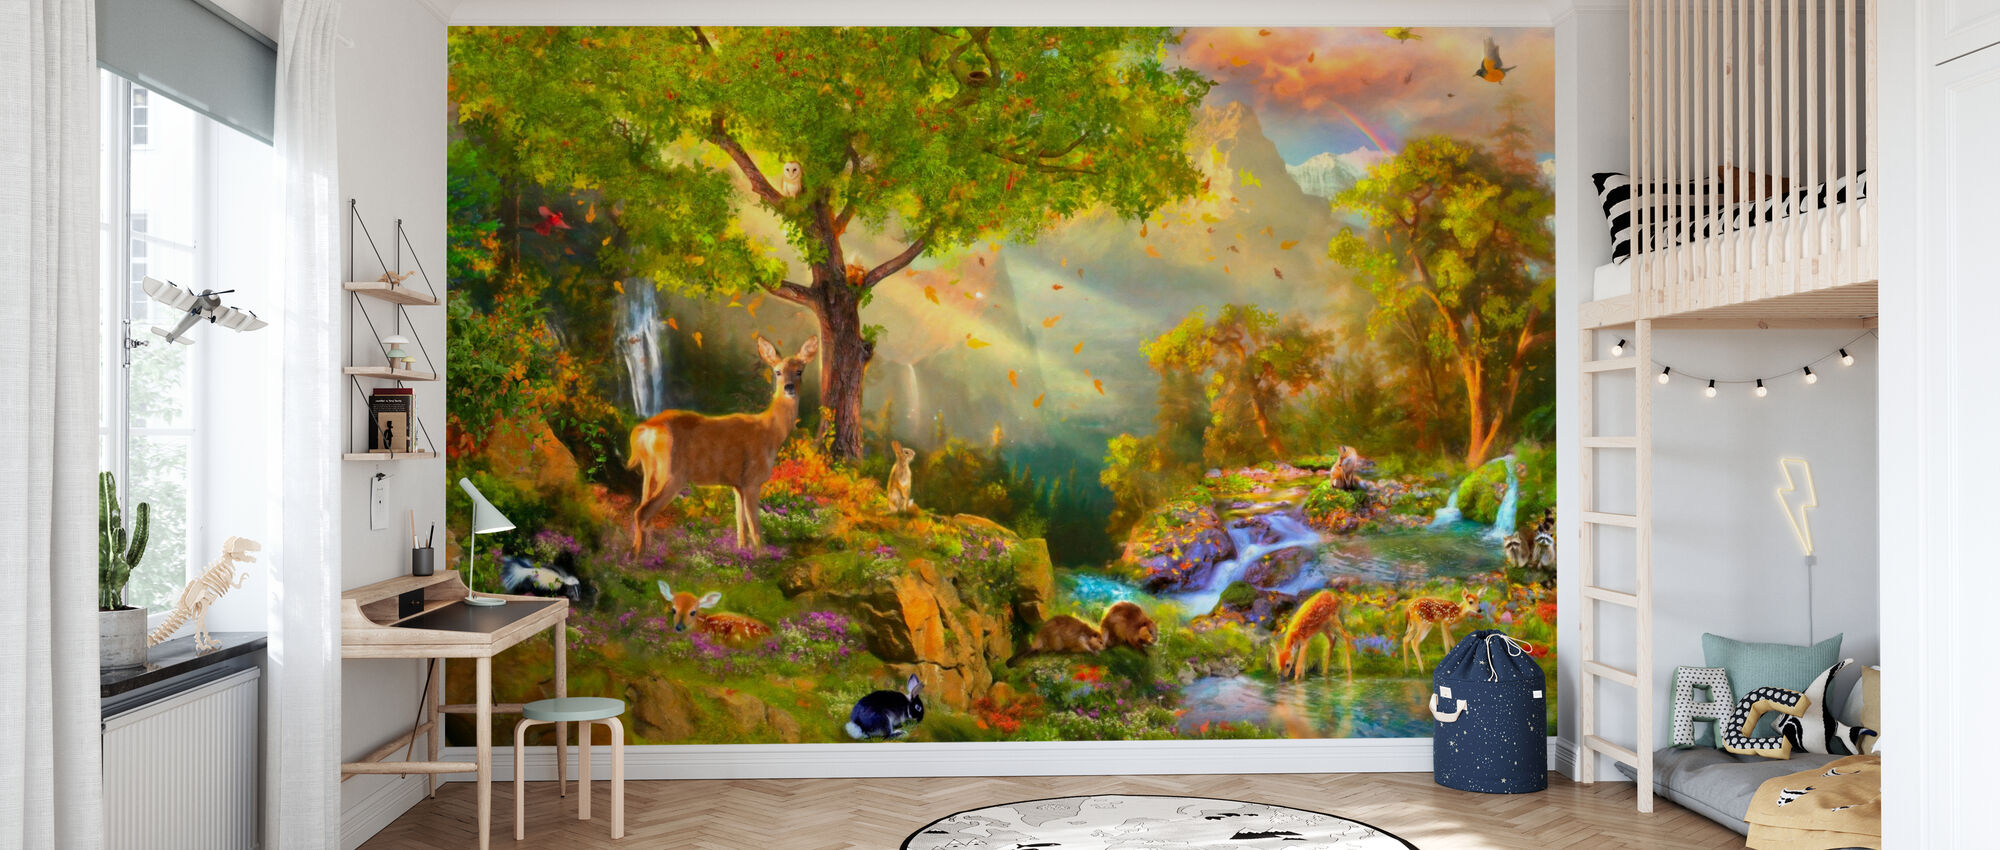 Fawn Mountain - Wallpaper - Kids Room